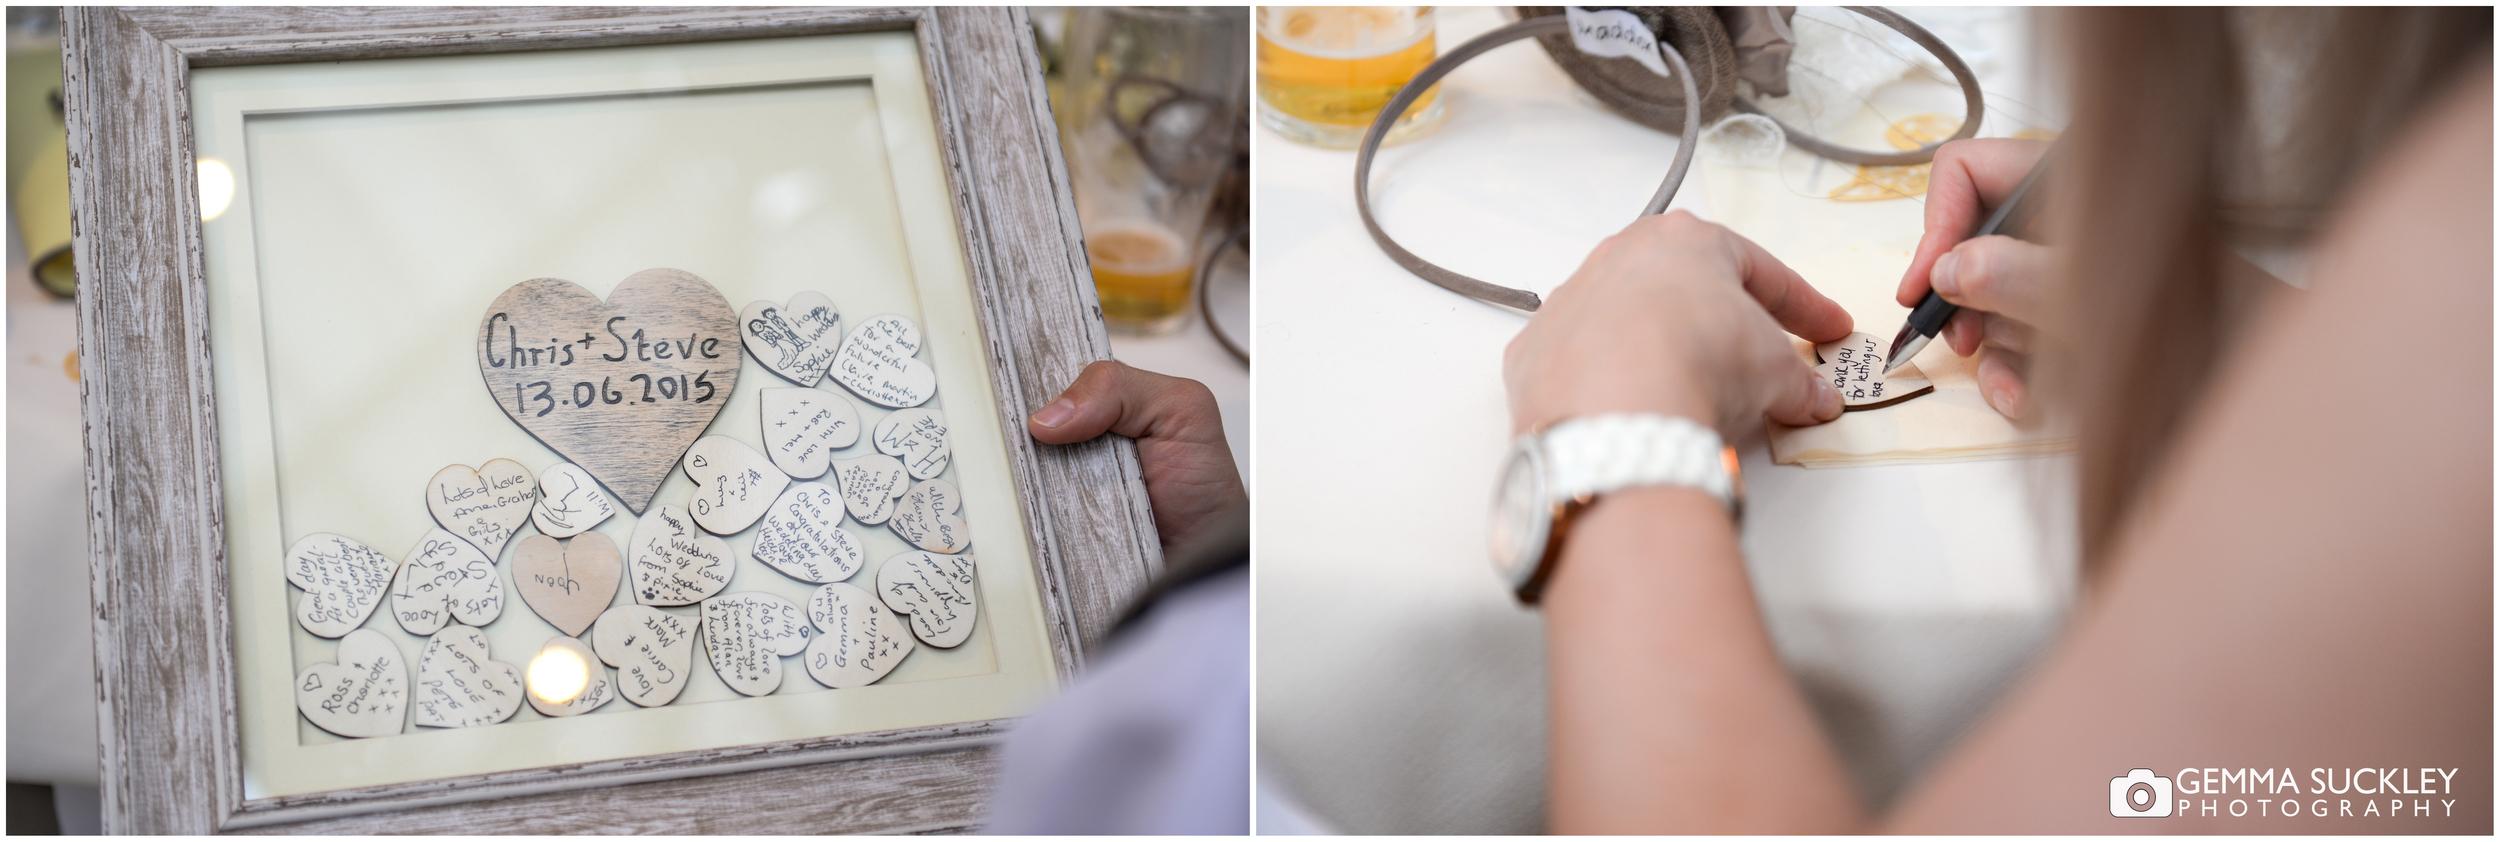 wedding-detail-yorkshire-photographer.jpg